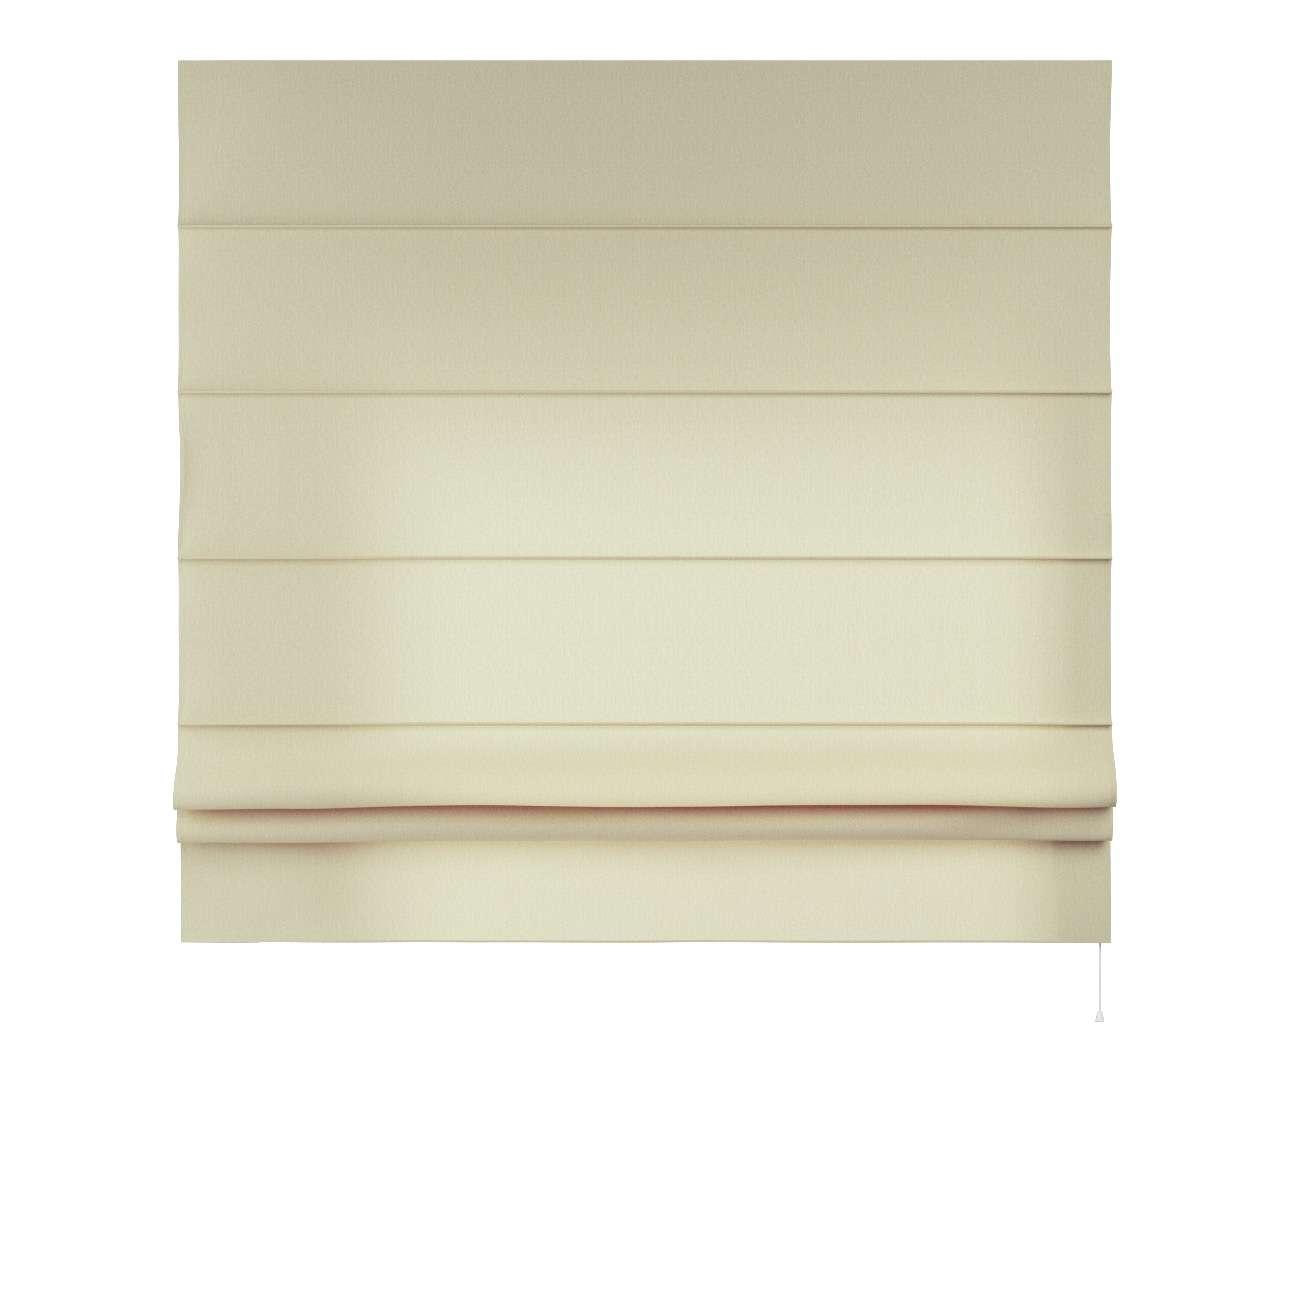 Romanetės Padva 80 x 170 cm (plotis x ilgis) kolekcijoje Chenille, audinys: 702-22